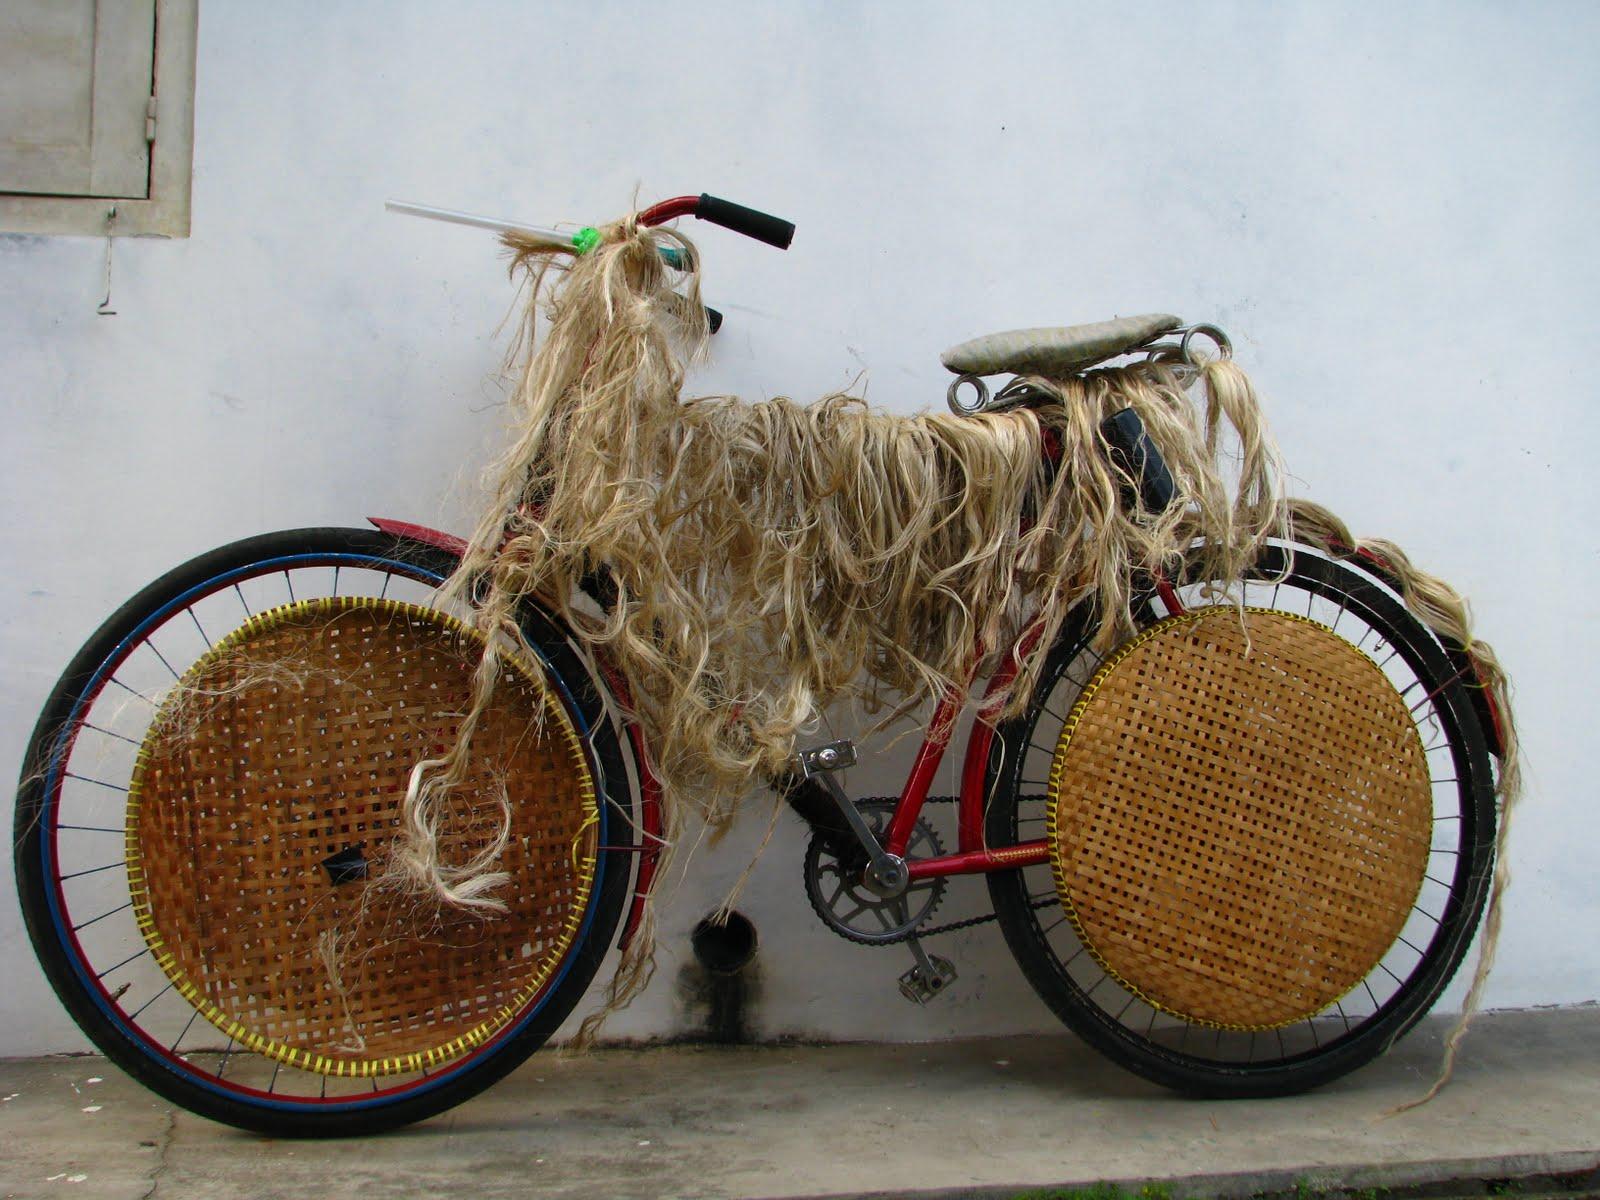 Hair Bike  by Das Butcher, Roda Roda Soundsystem, 2010